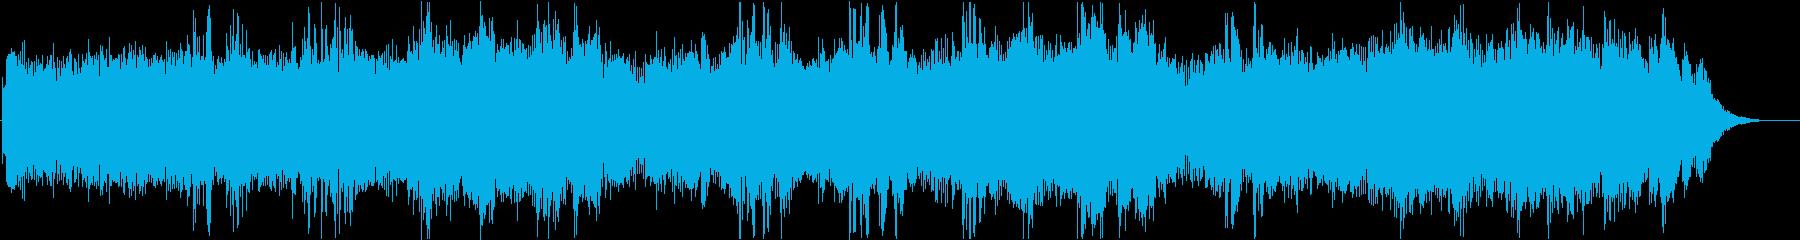 BLANK PAGEの再生済みの波形